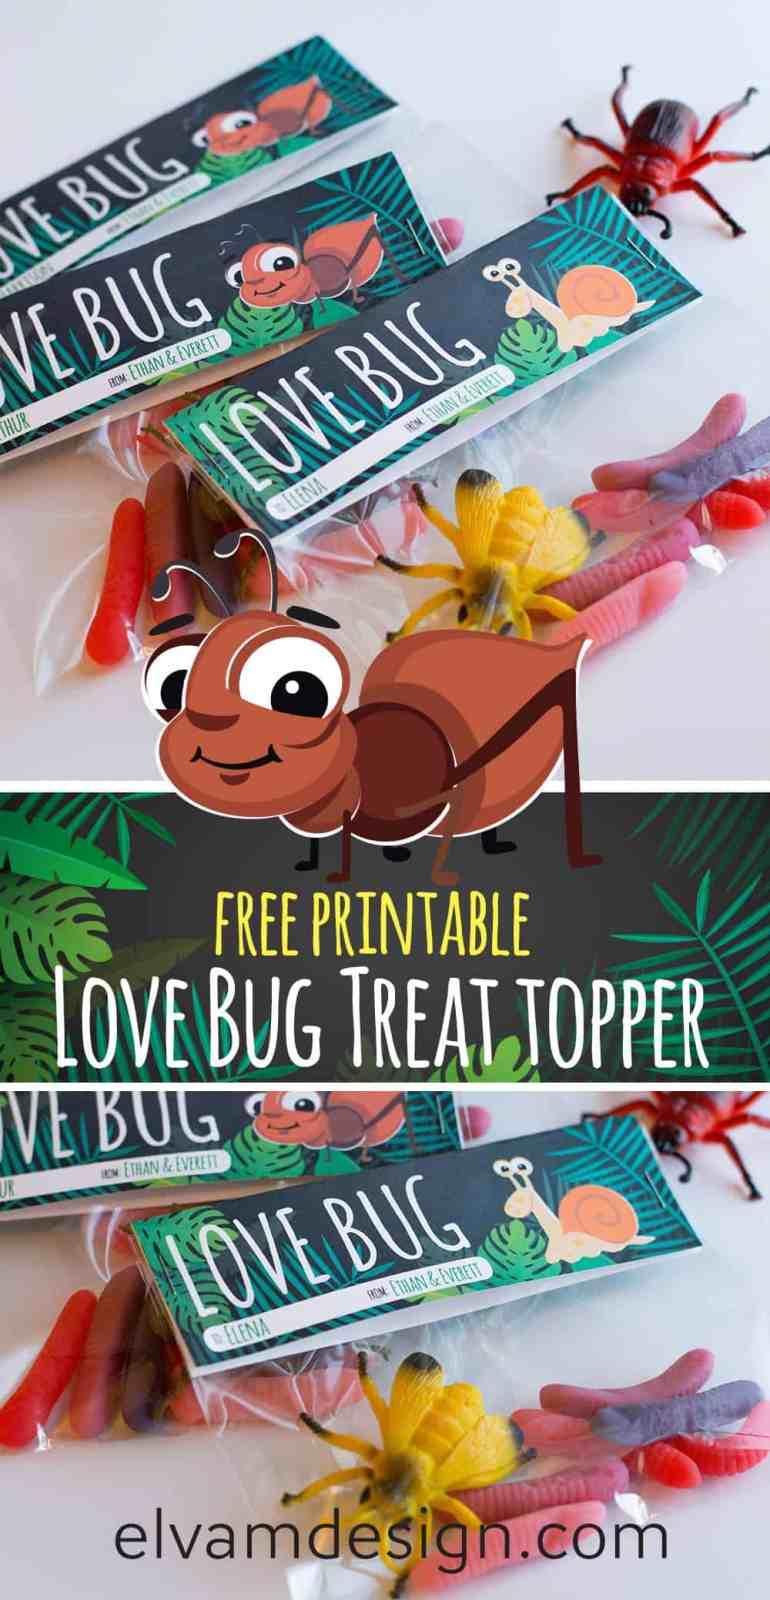 Download this free Love Bug Valentines Treat Topper at elvamdesign.com